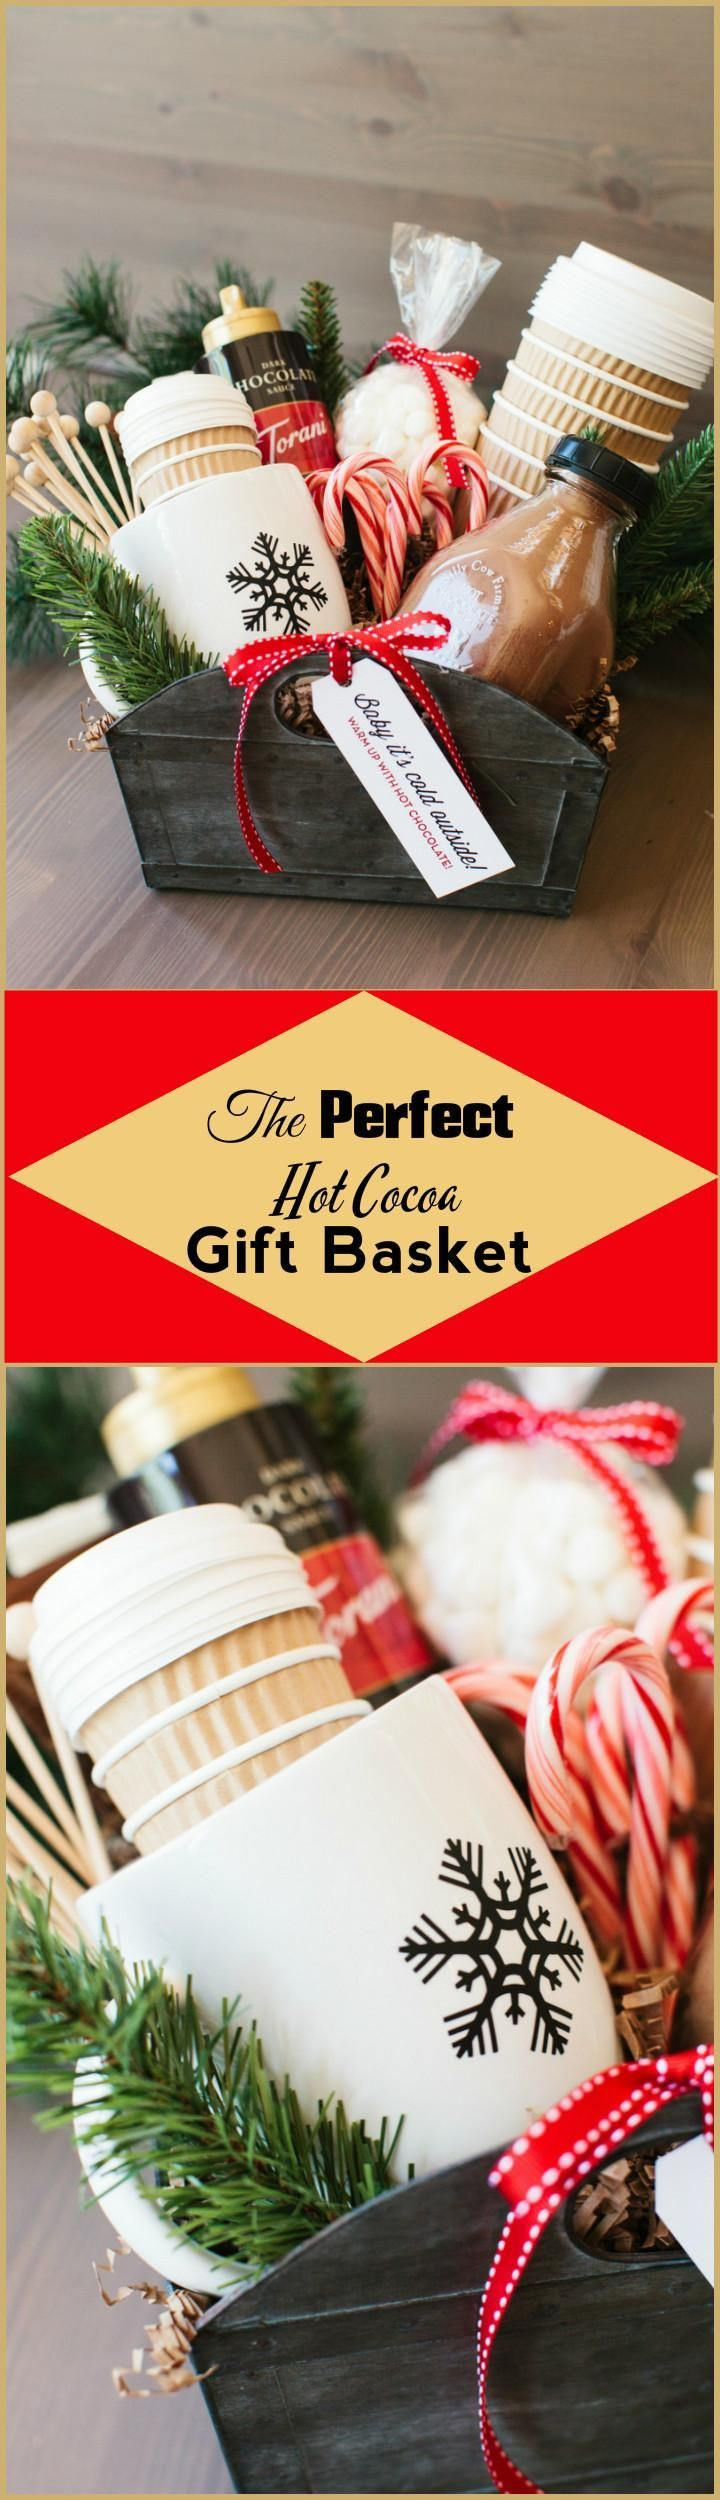 70 Inexpensive DIY Gift Basket Ideas